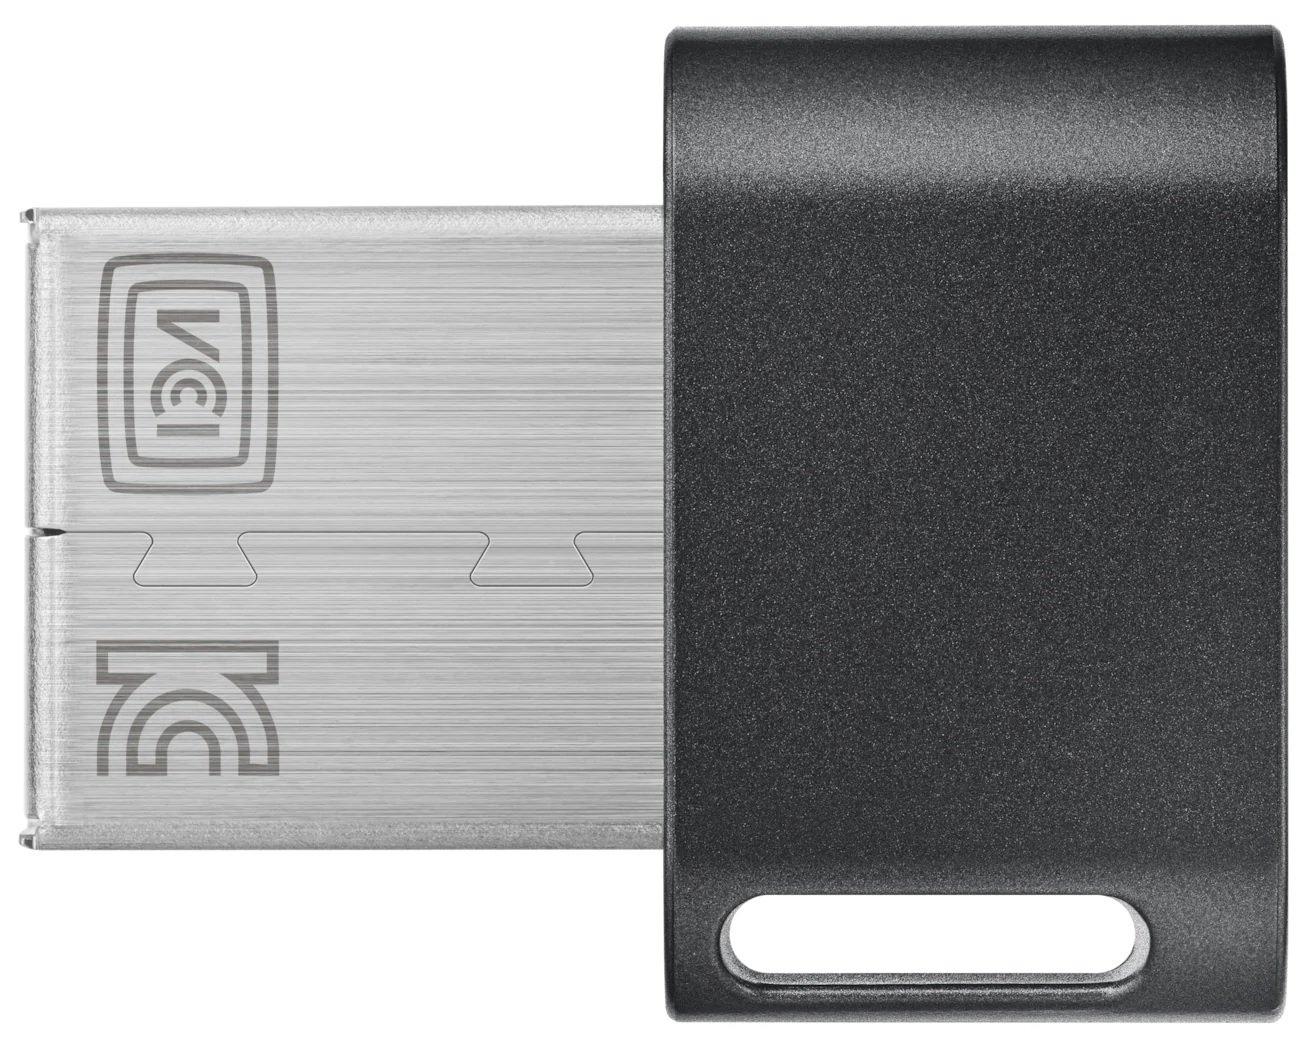 Накопичувач USB 3.1 SAMSUNG FIT PLUS 256GB (MUF-256AB/APC) фото2